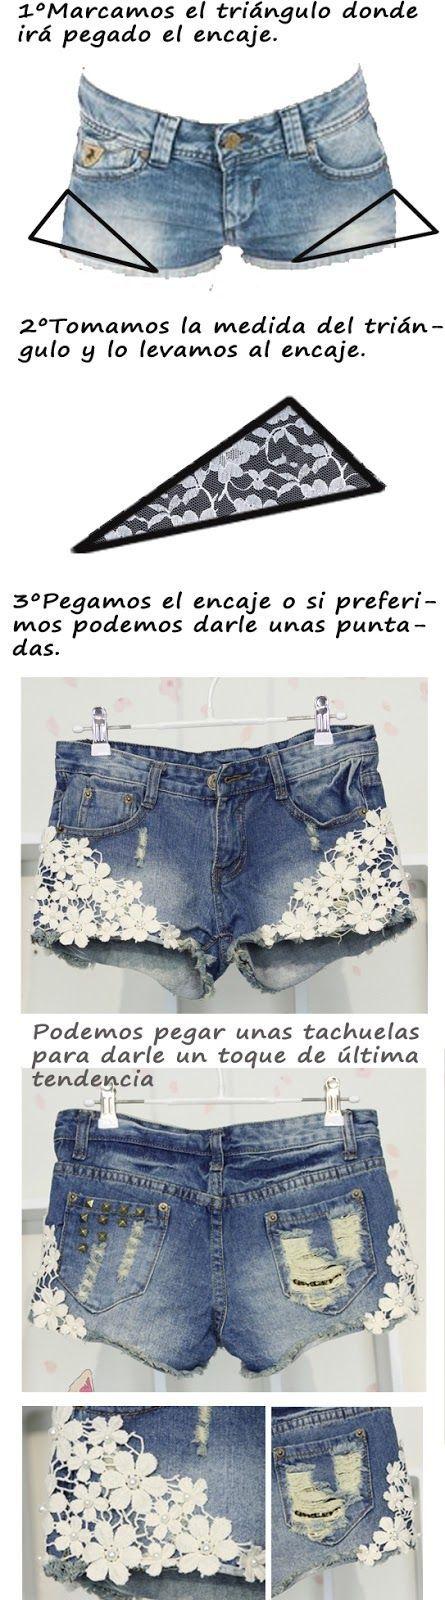 DIY shorts con encaje   BestLookzone: